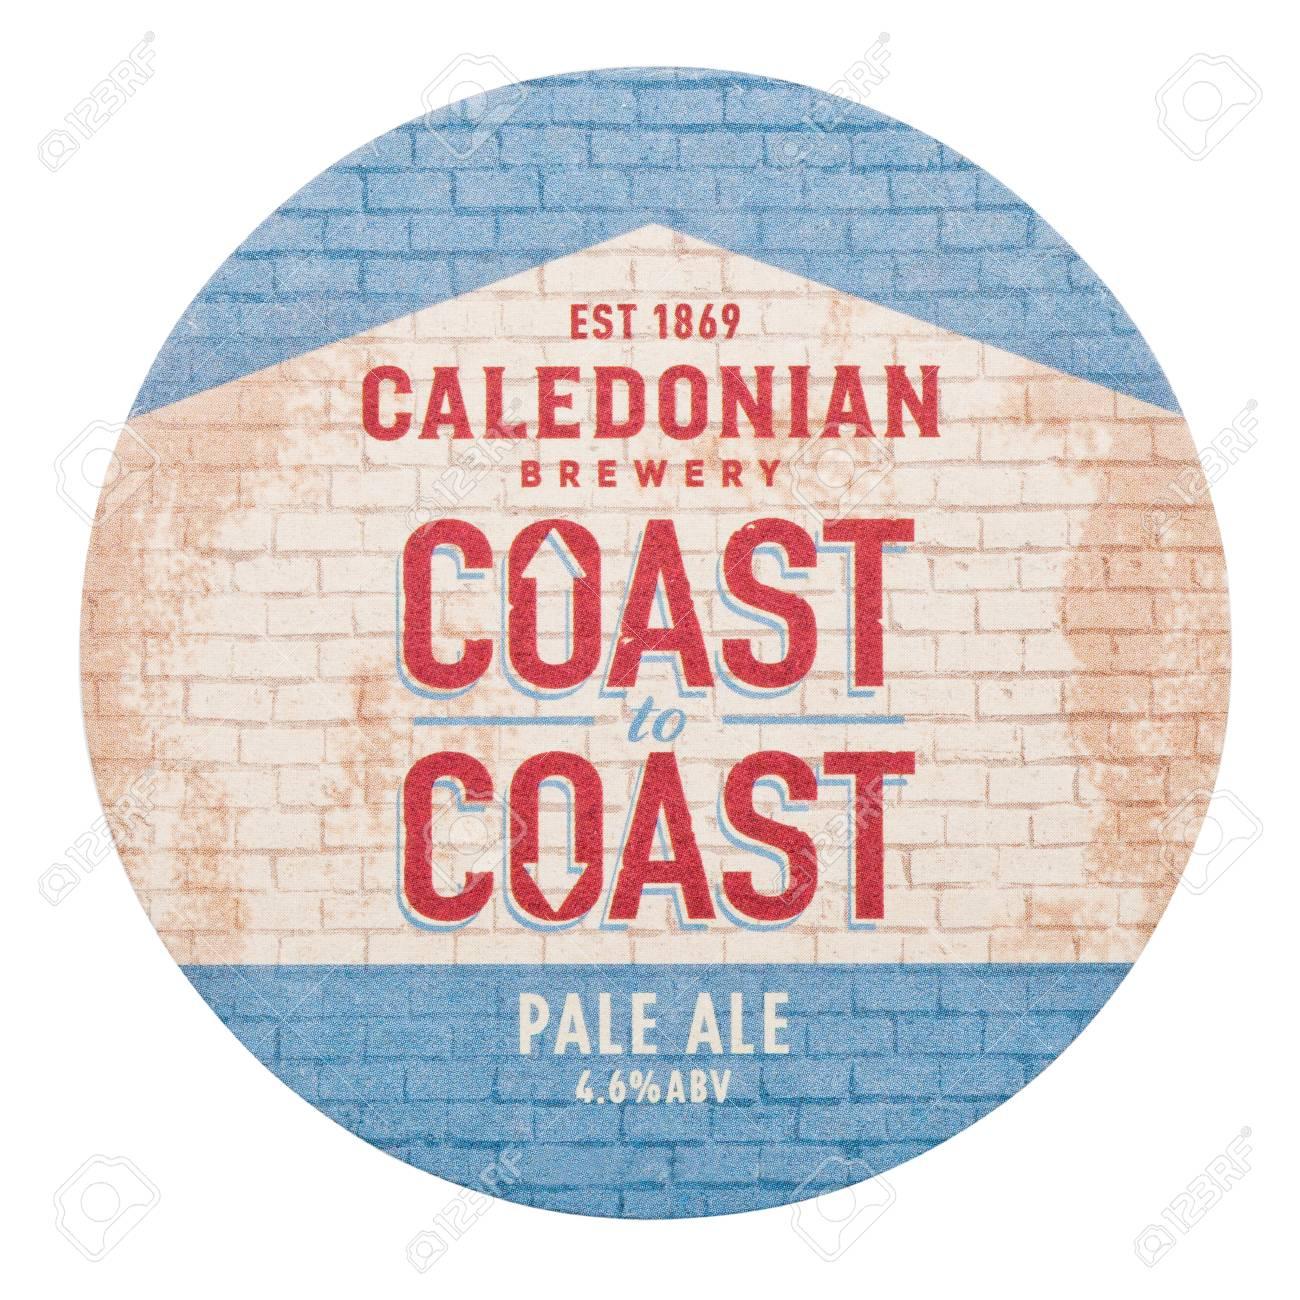 LONDON, UK - FEBRUARY 04, 2018: Caledonian brewery coast to coast